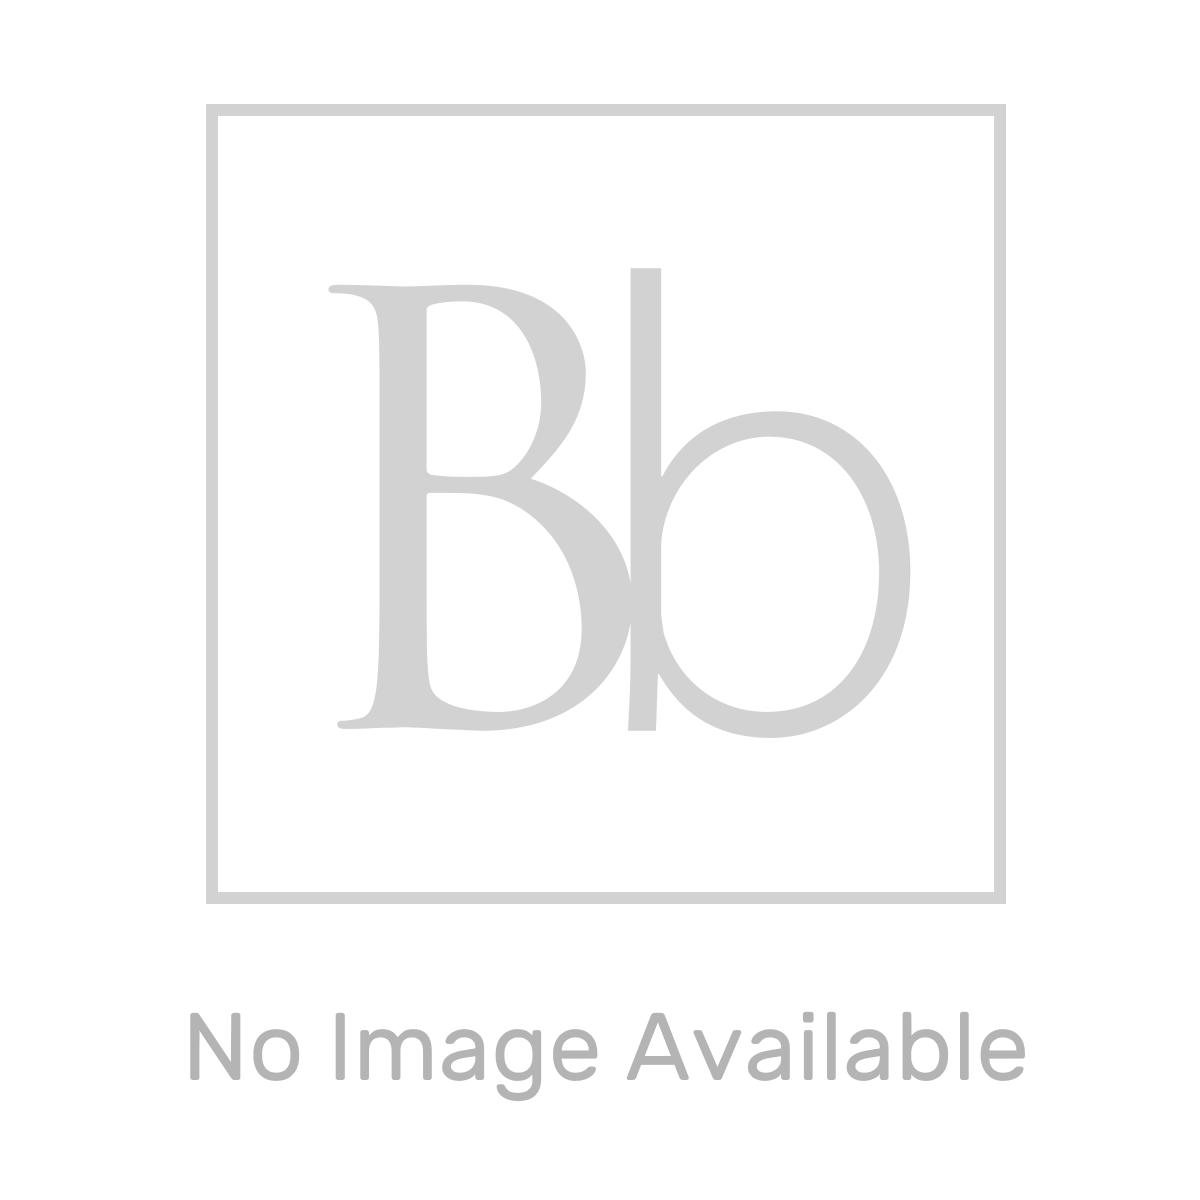 Kartell K-vit White Adapt P Shaped Right Hand Bath with Leg Sets 1700mm